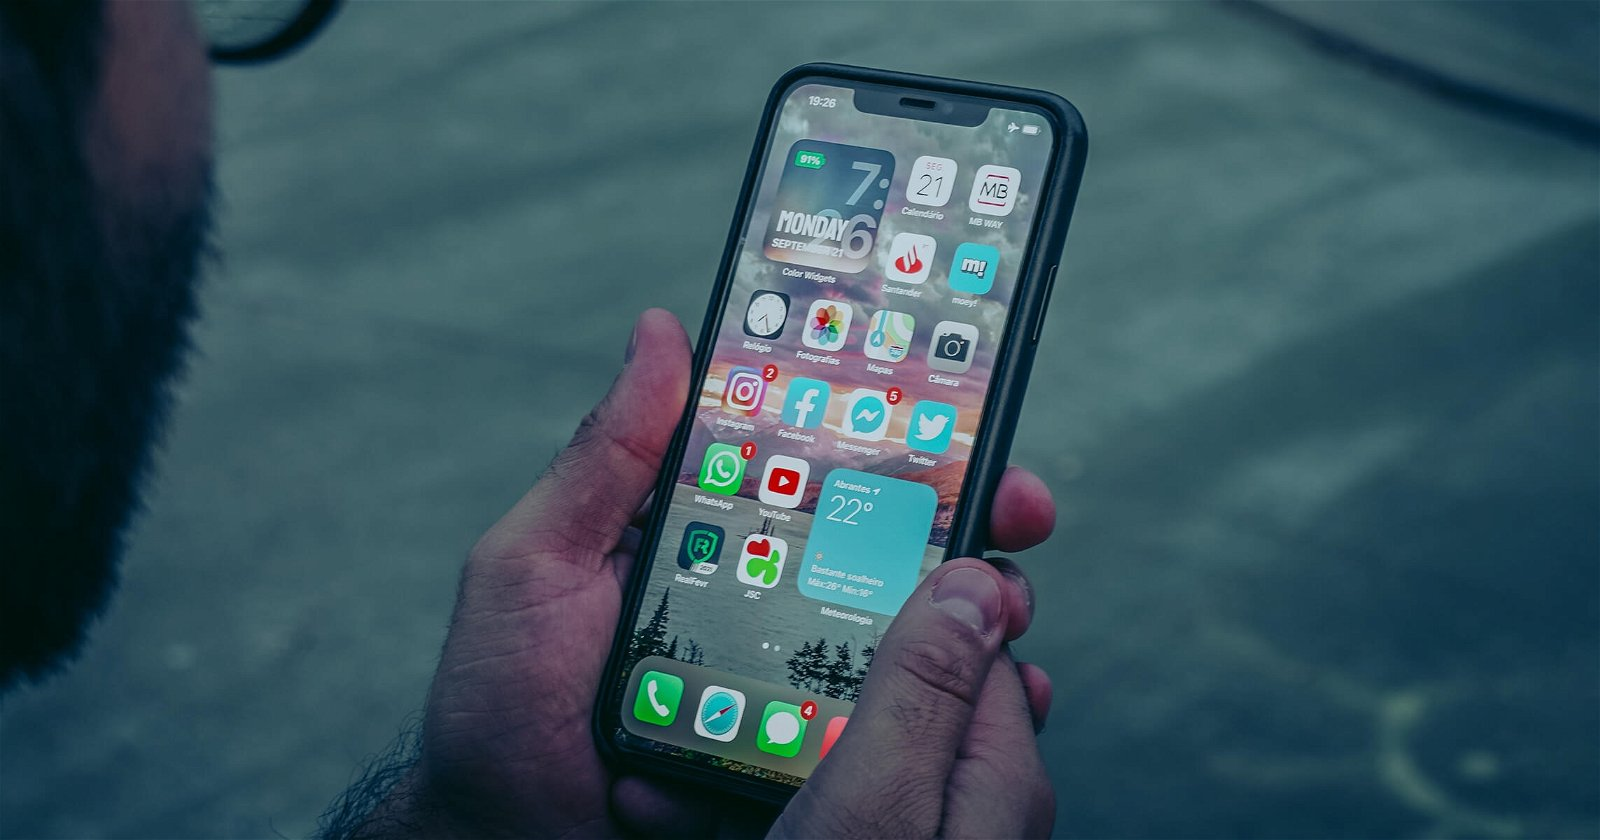 iPhone iOS widgets